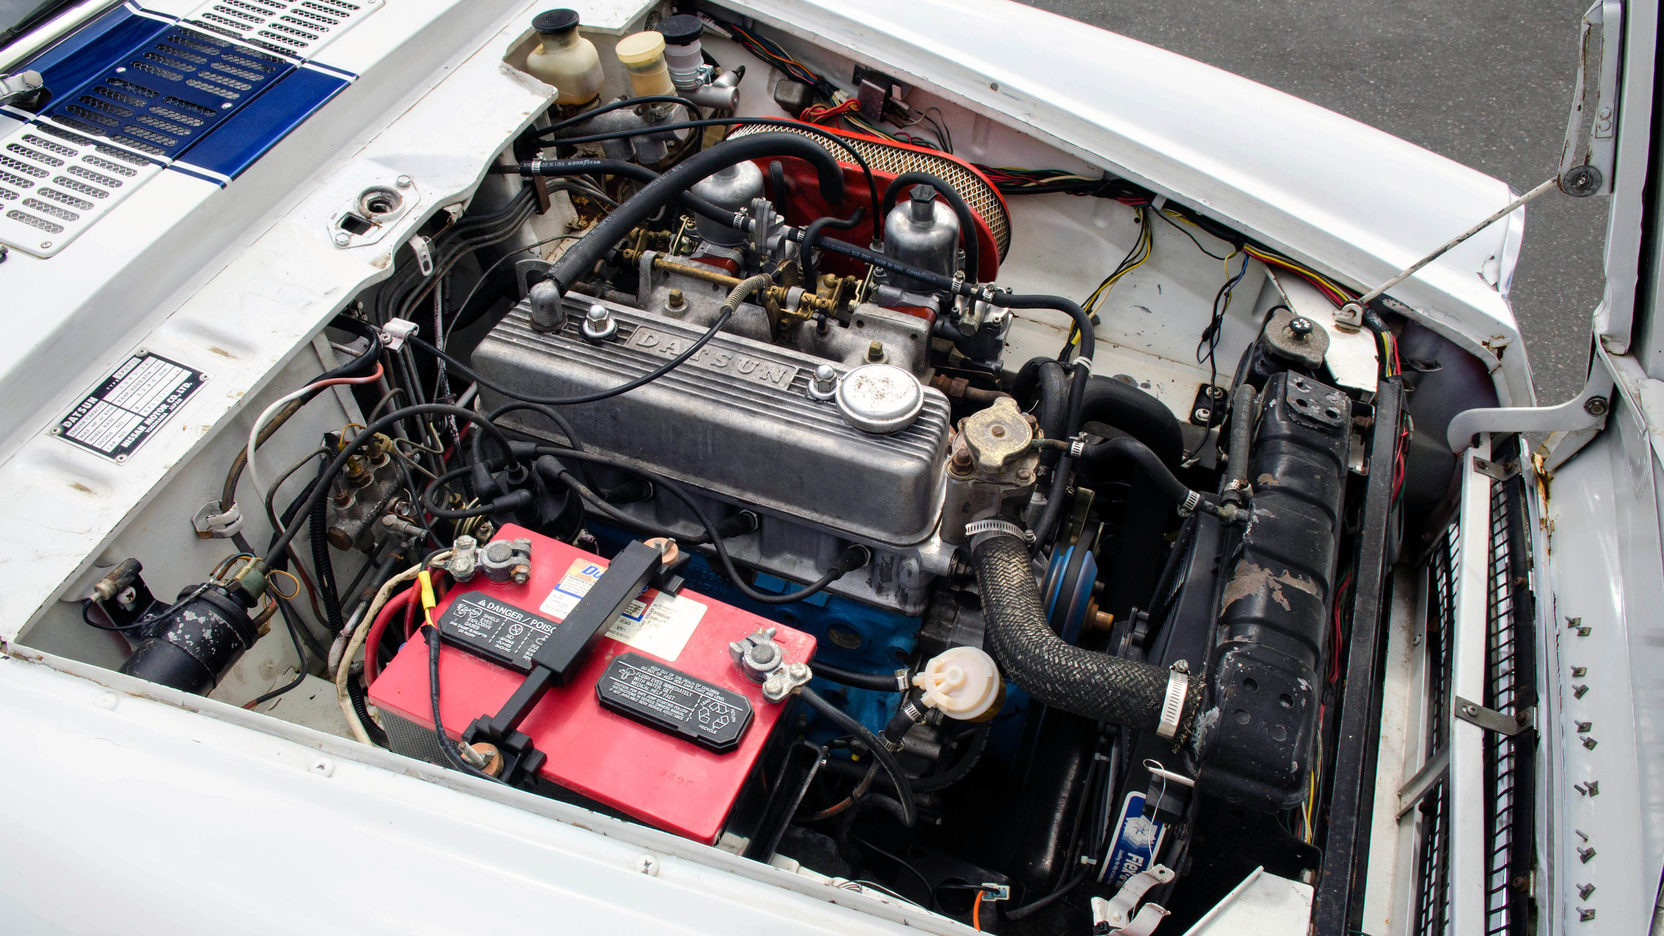 1970 Datsun 1600 engine